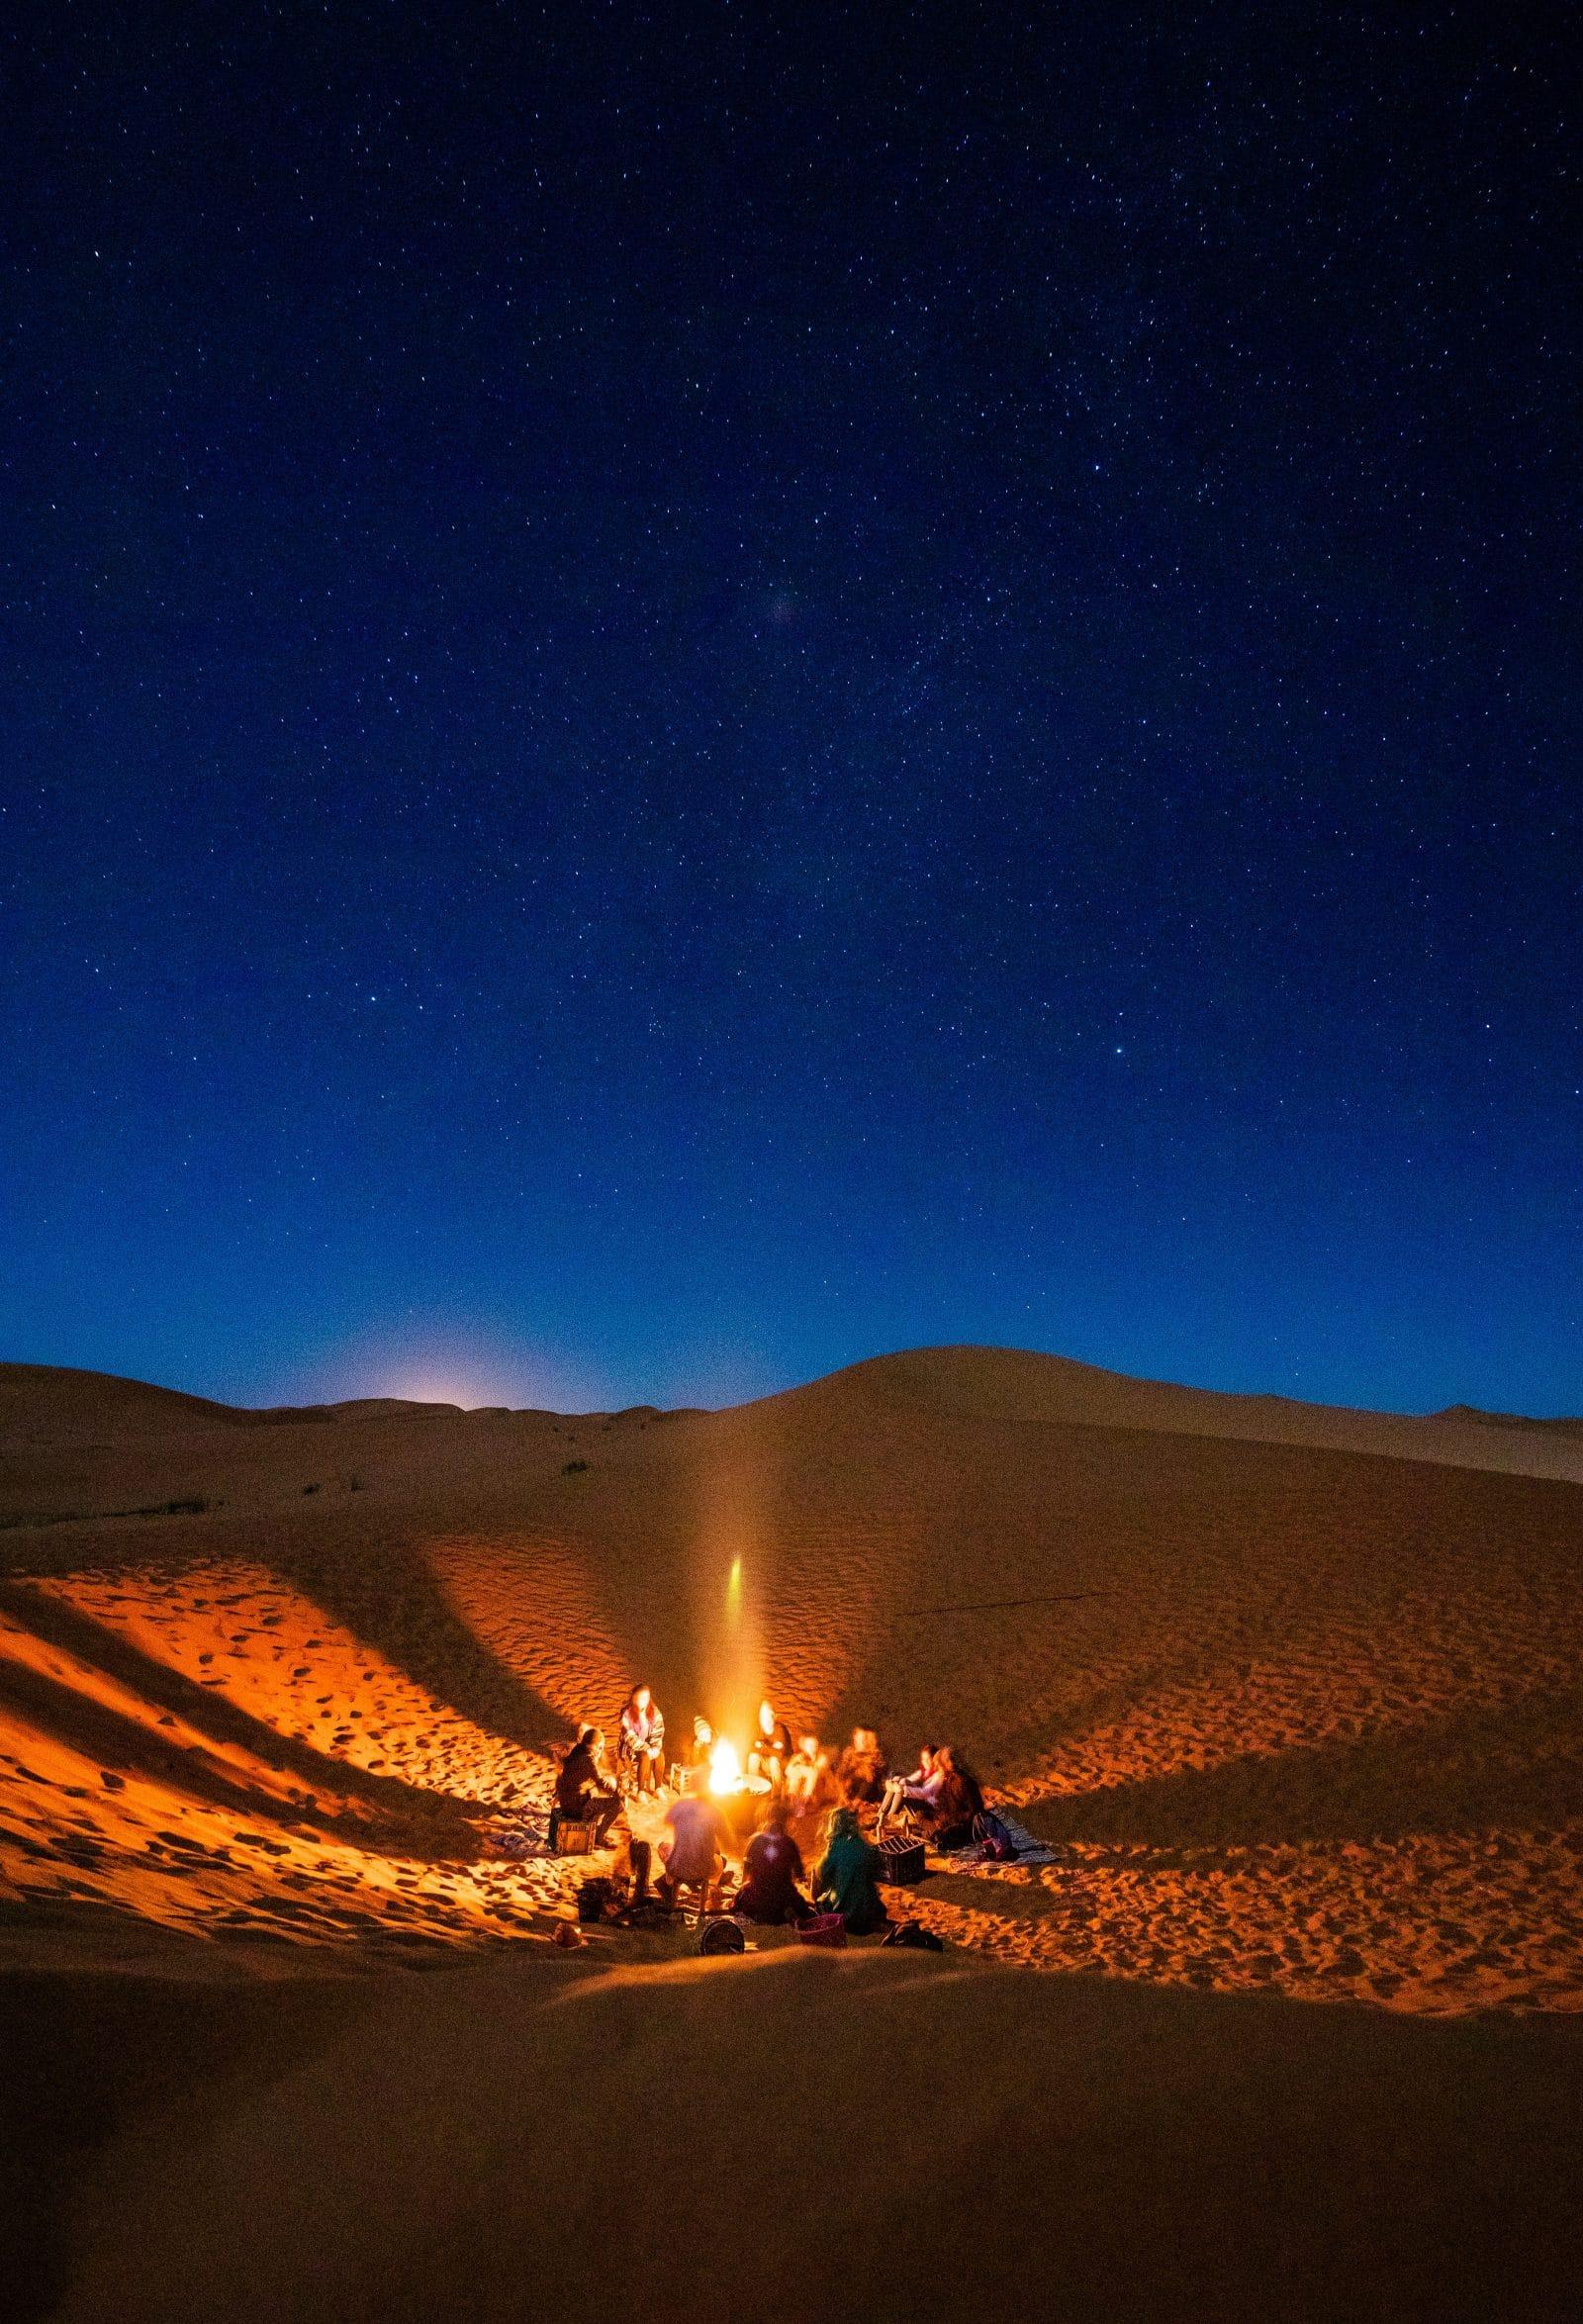 Bonfire in the Moroccan Sahara Desert